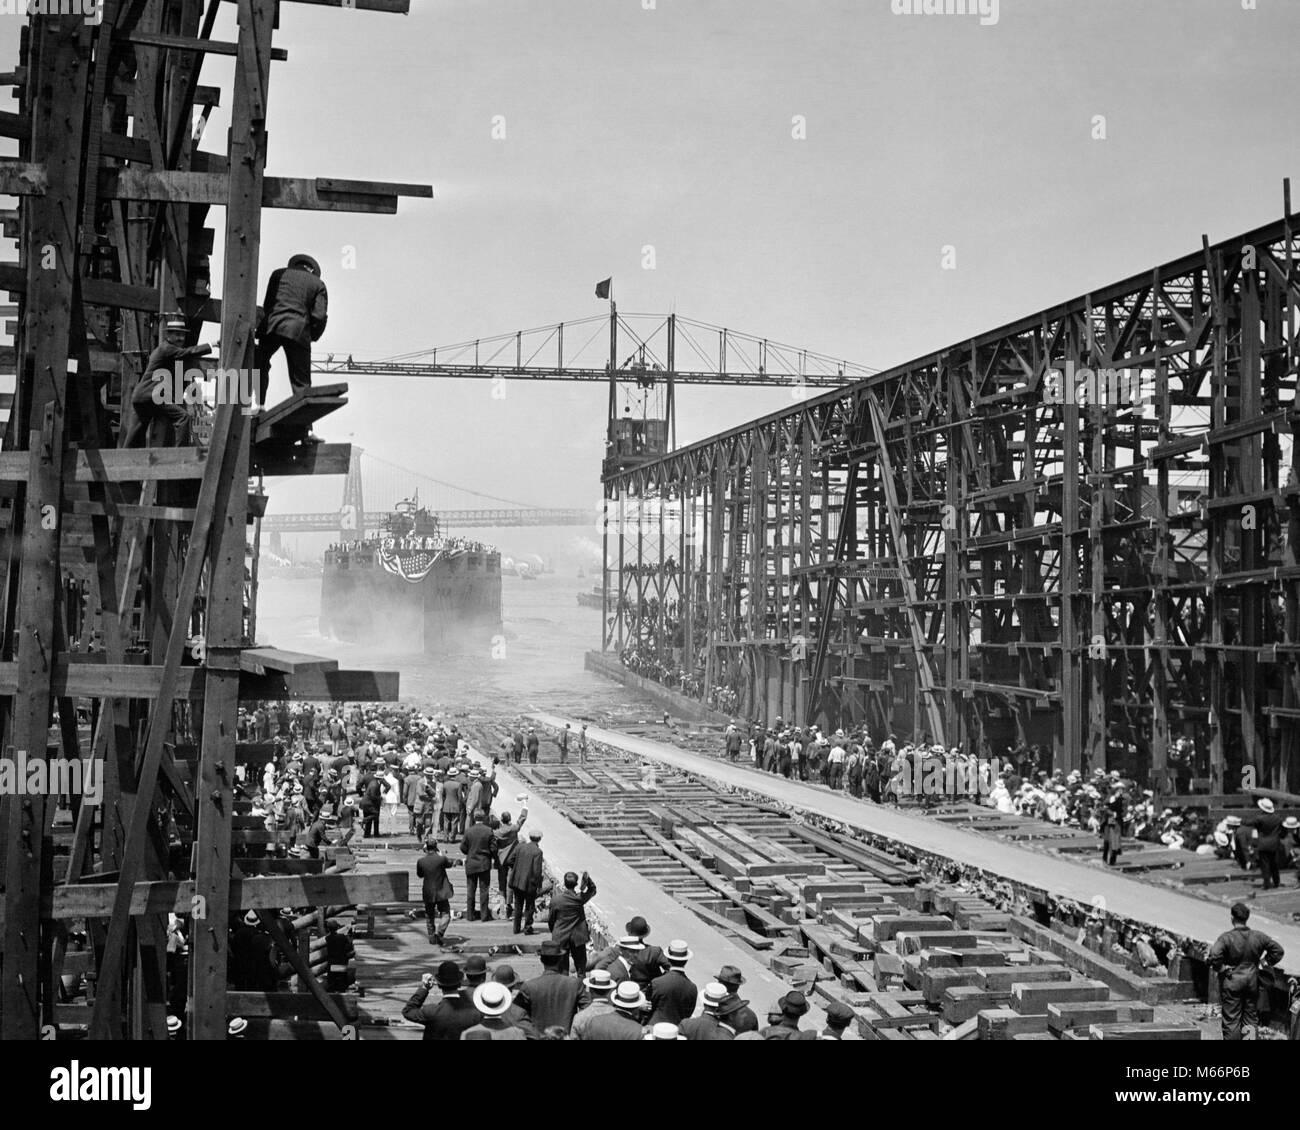 1910s 1940s LAUNCHING BATTLESHIP ARIZONA JUNE 1915 SHIP SUNK PEARL HARBOR DECEMBER 7 1941 BROOKLYN NAVY YARDS NEW - Stock Image